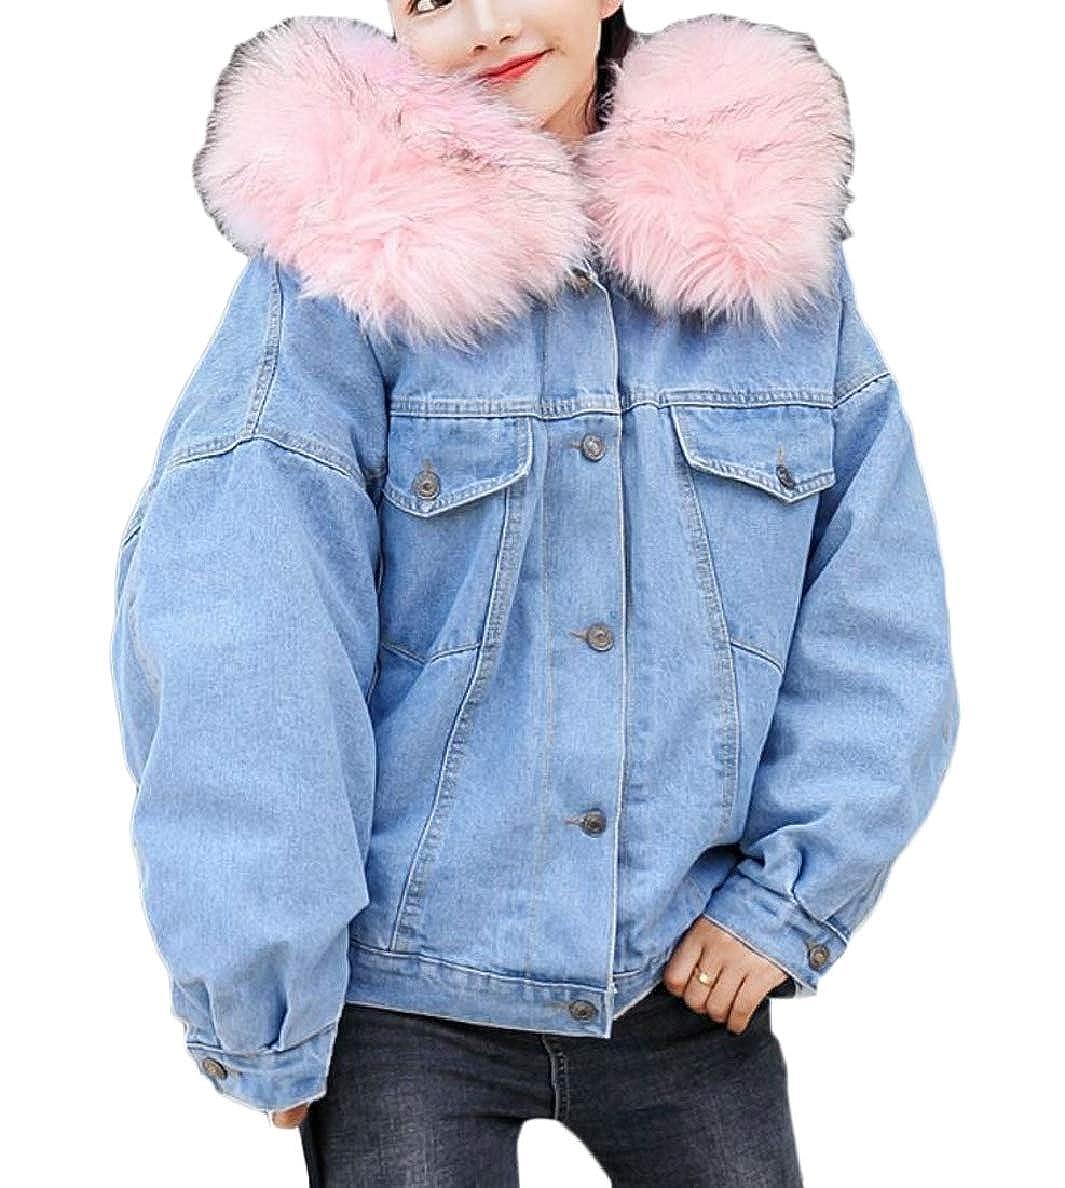 Xswsy XG-CA Women's Casual Loose Faux Fur Collar Thick Warm Fleece Denim Jacket Coat